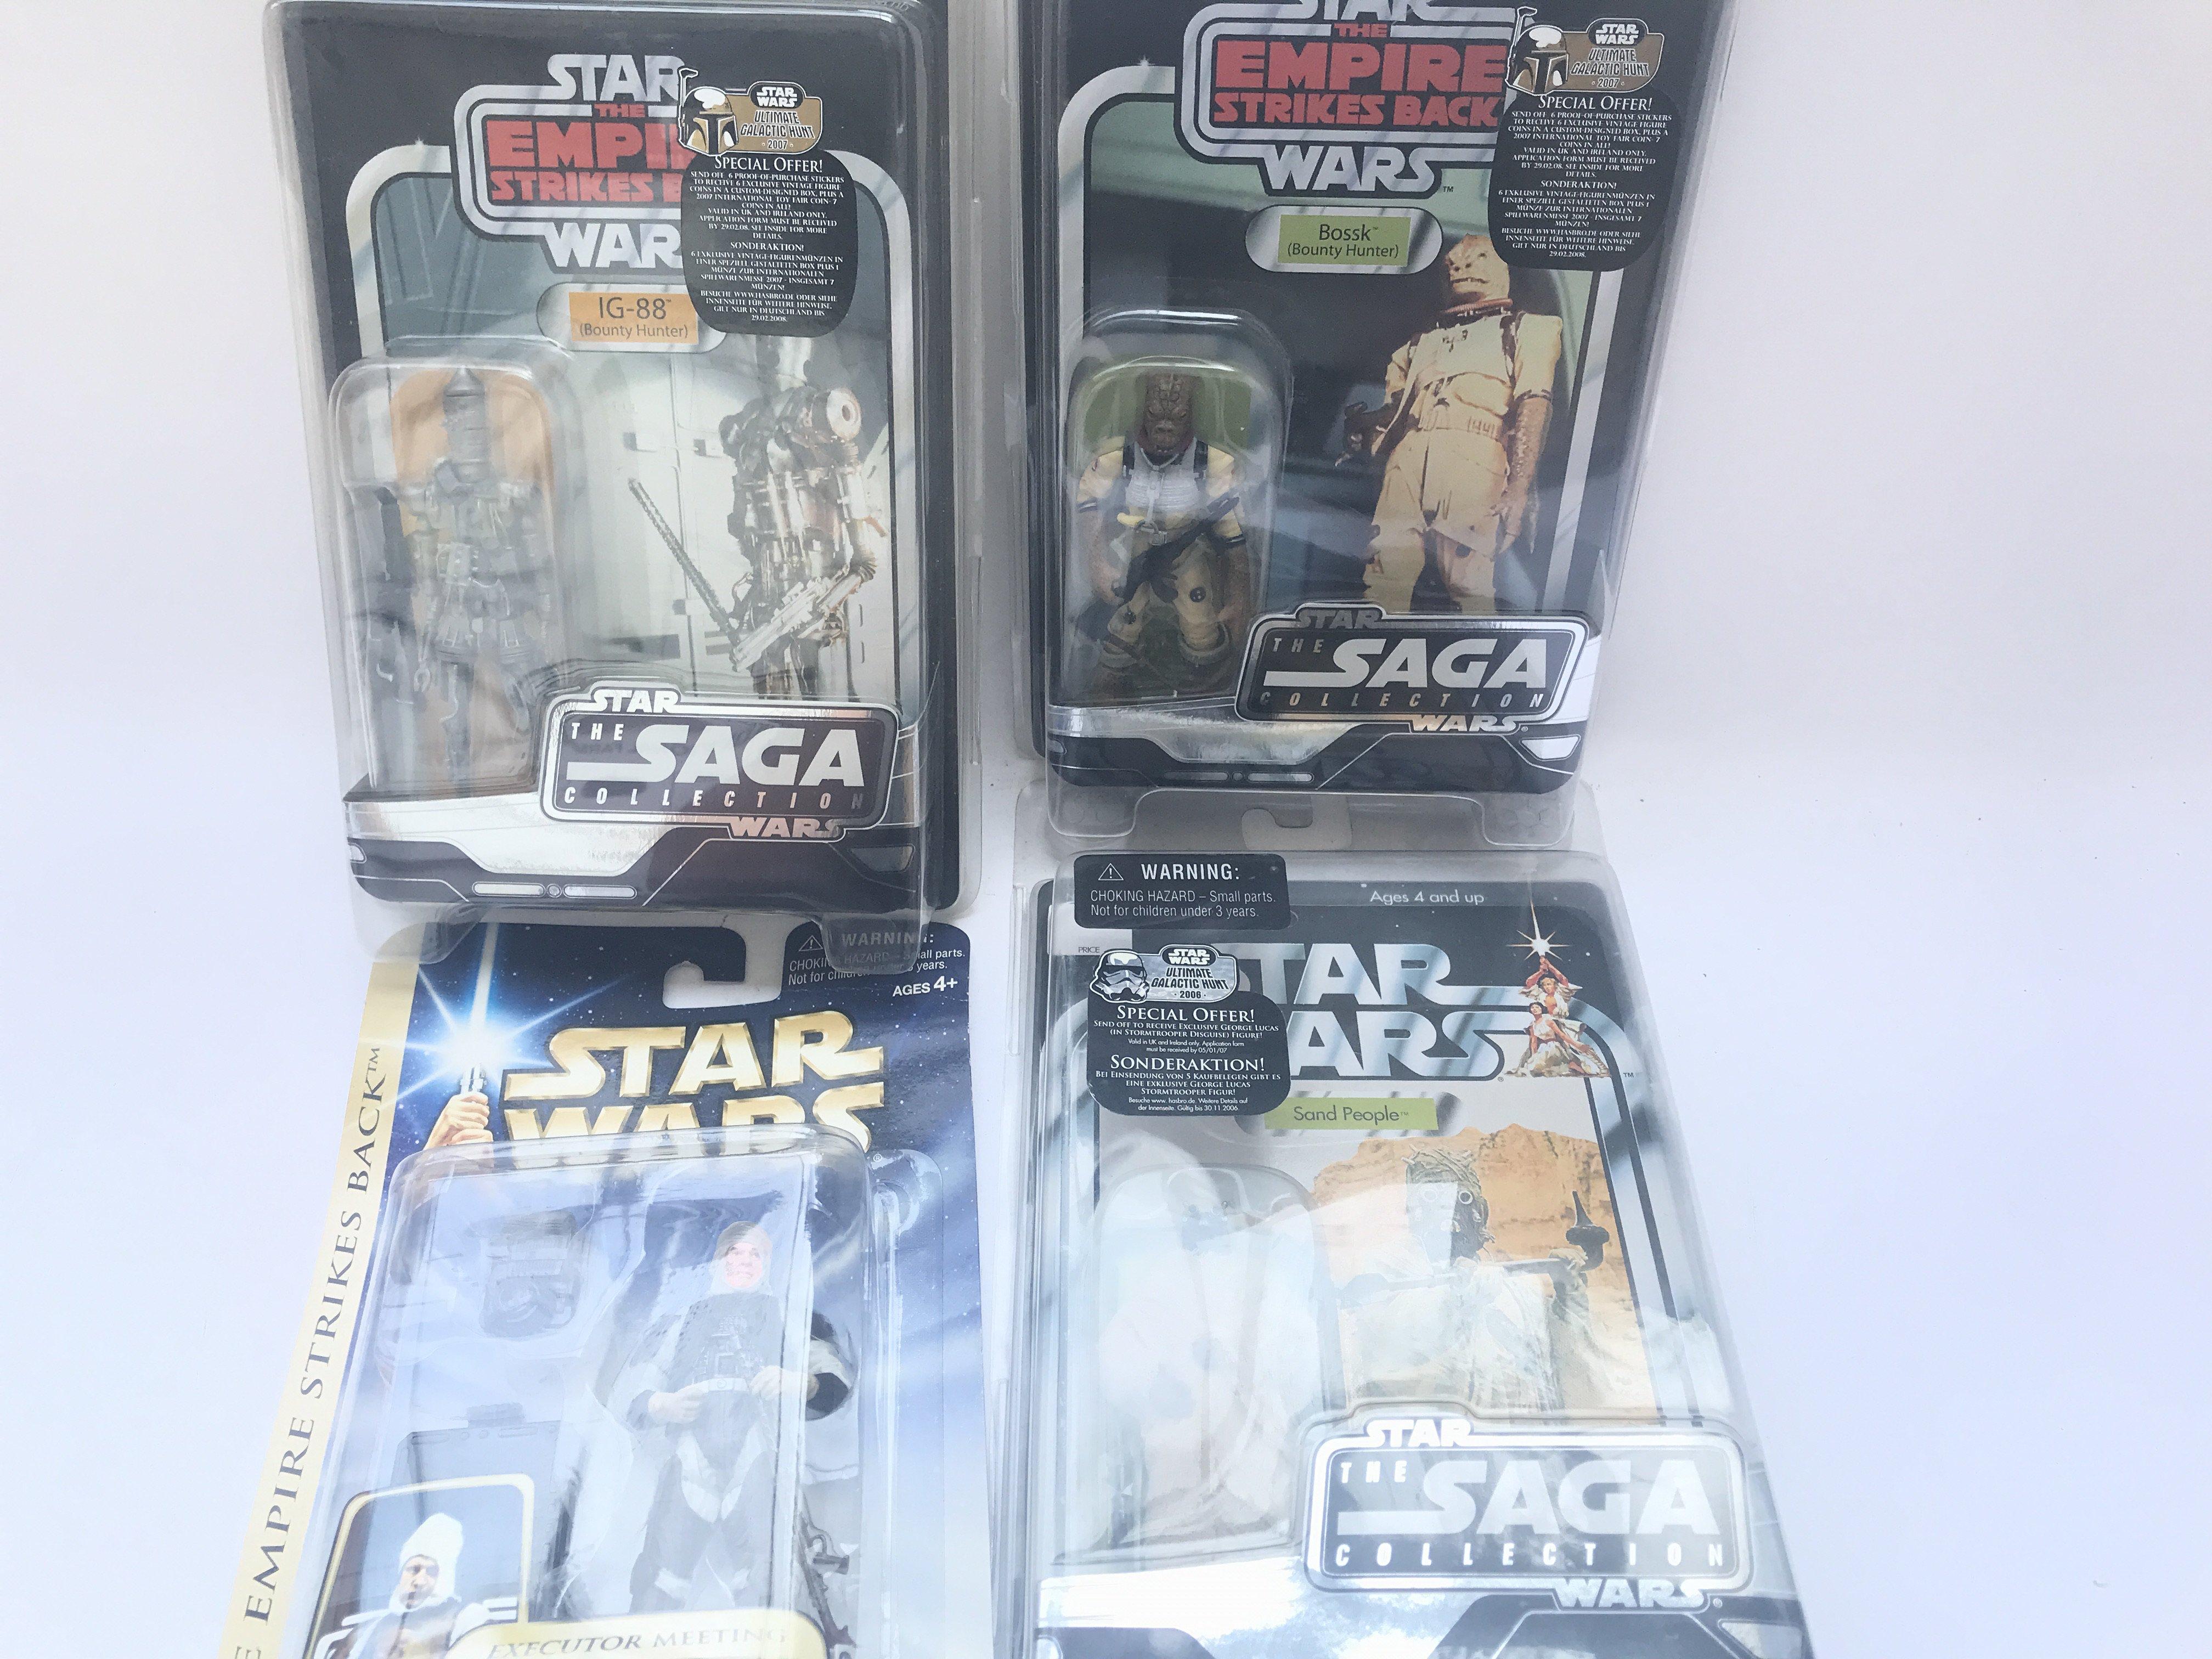 4 X Star Wars Carded Figures including 3 x Saga Co